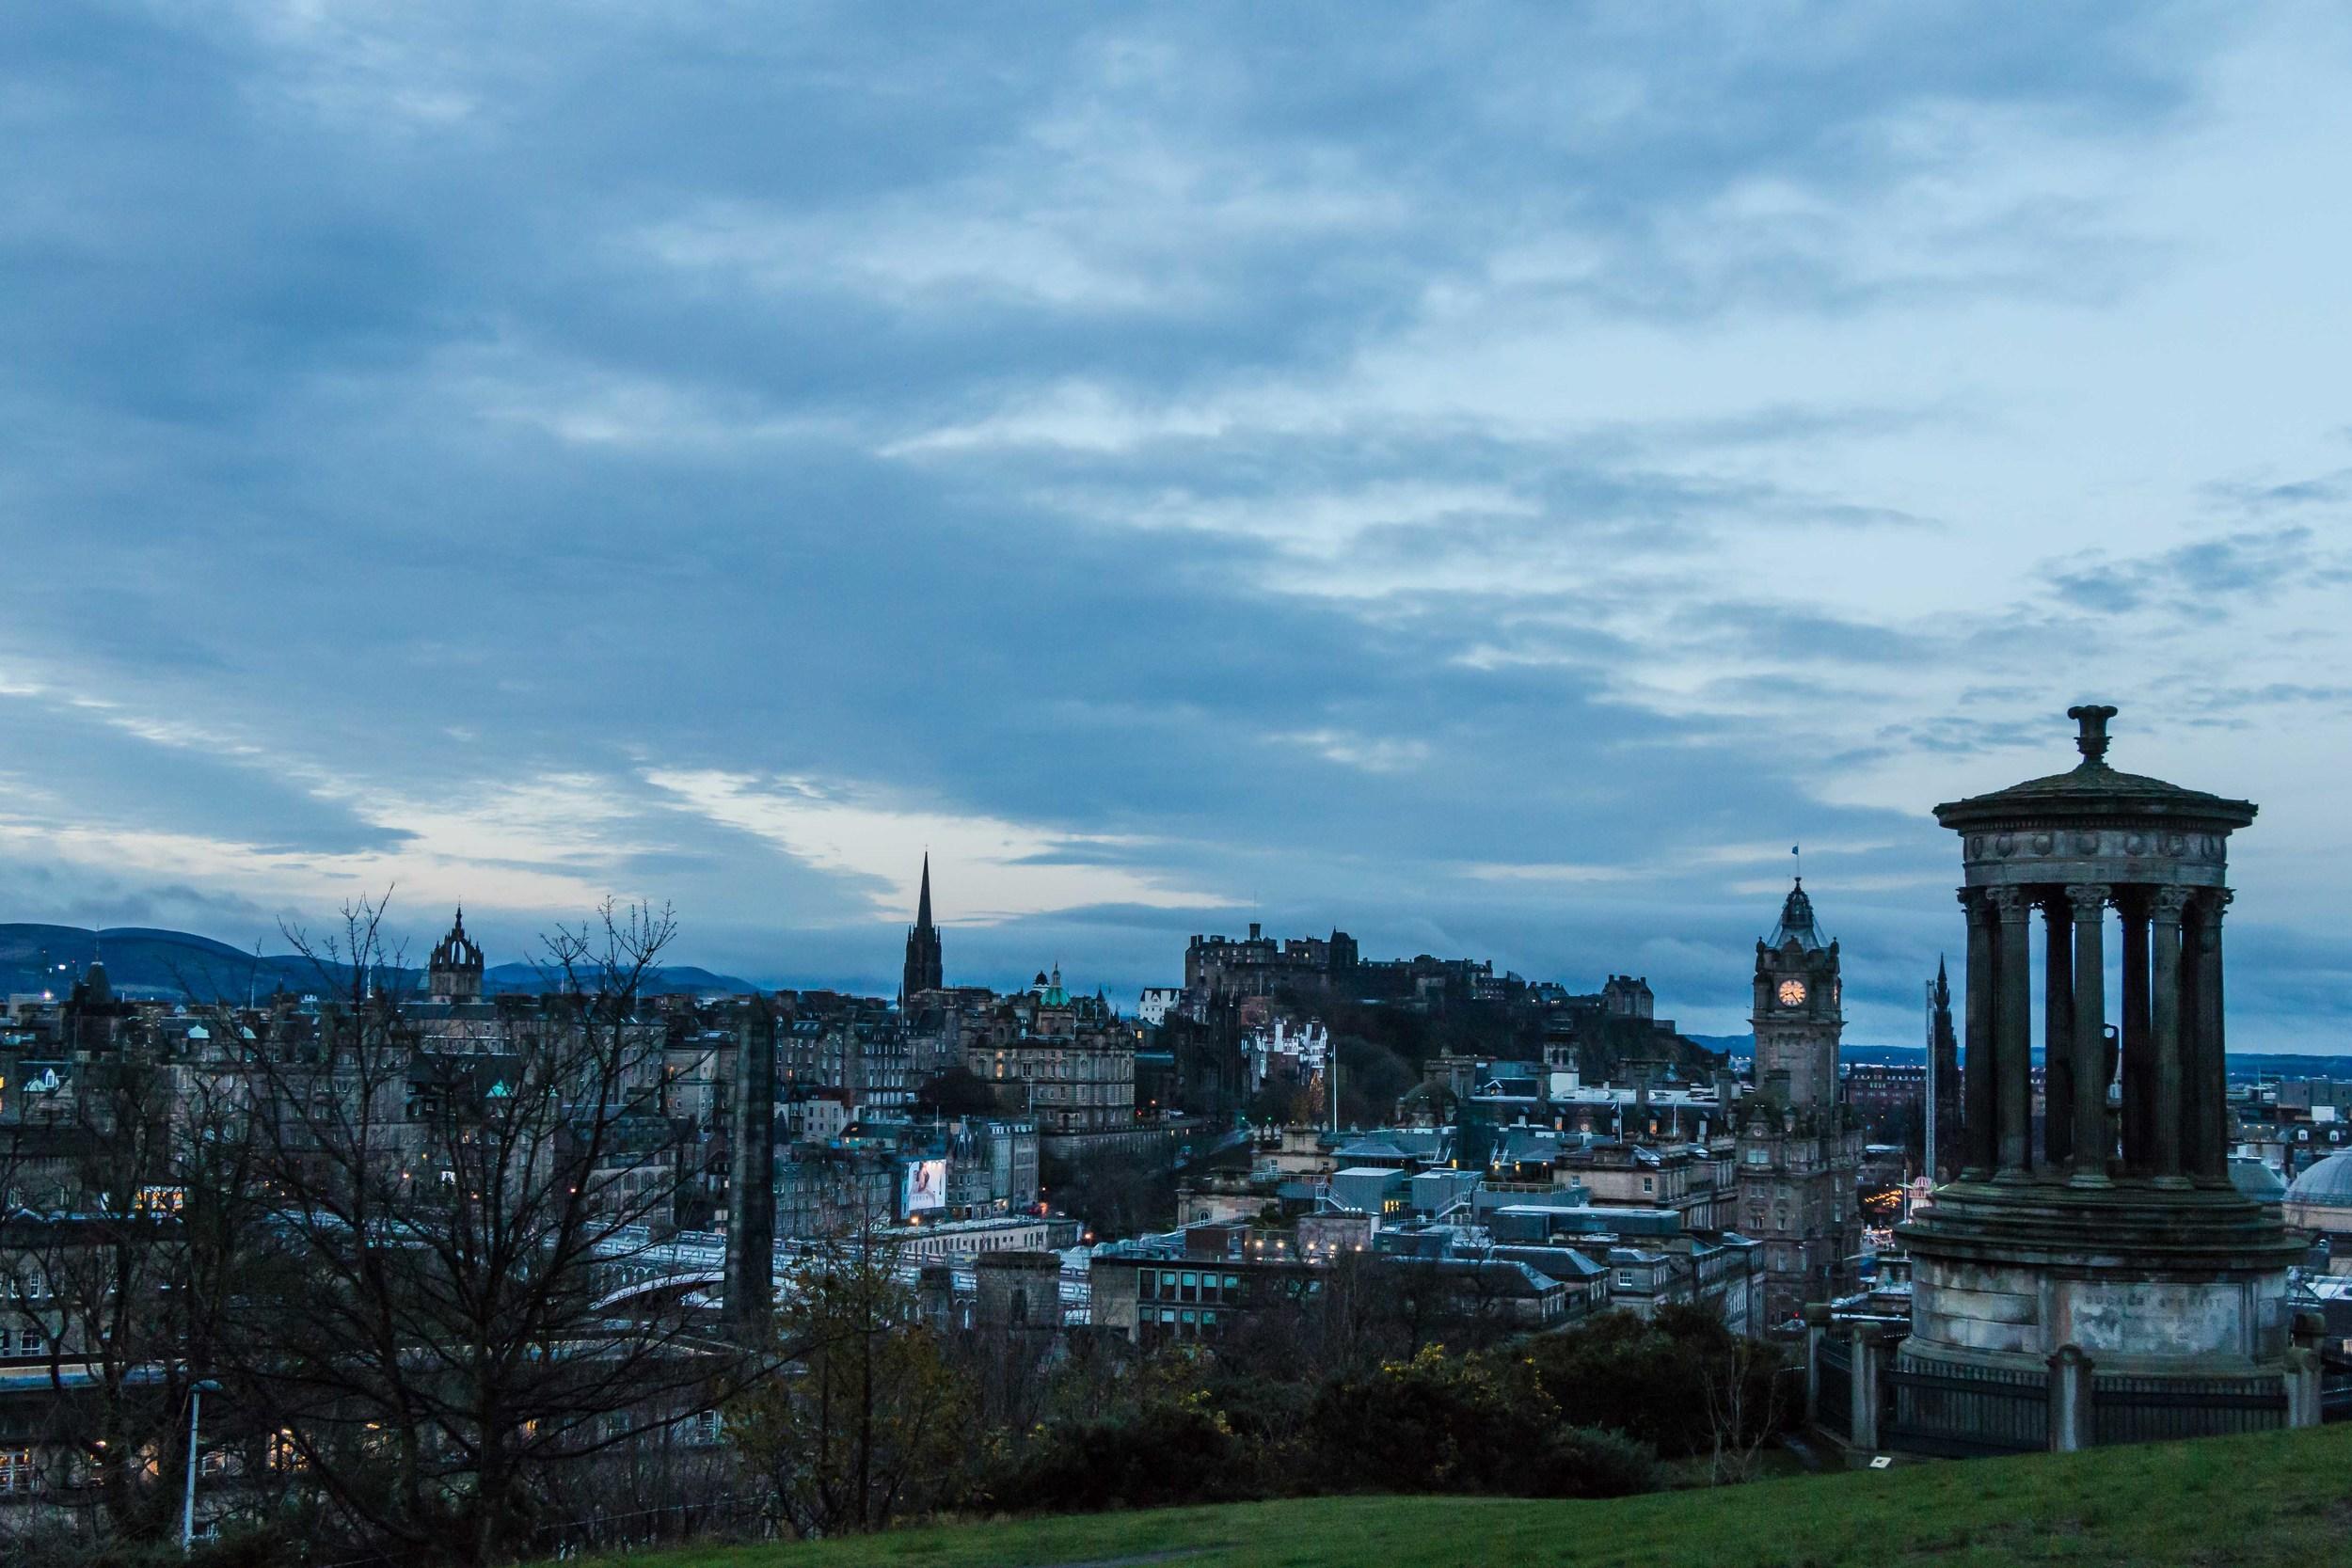 SOA_Edinburgh-Scotland-calton-hill.jpg